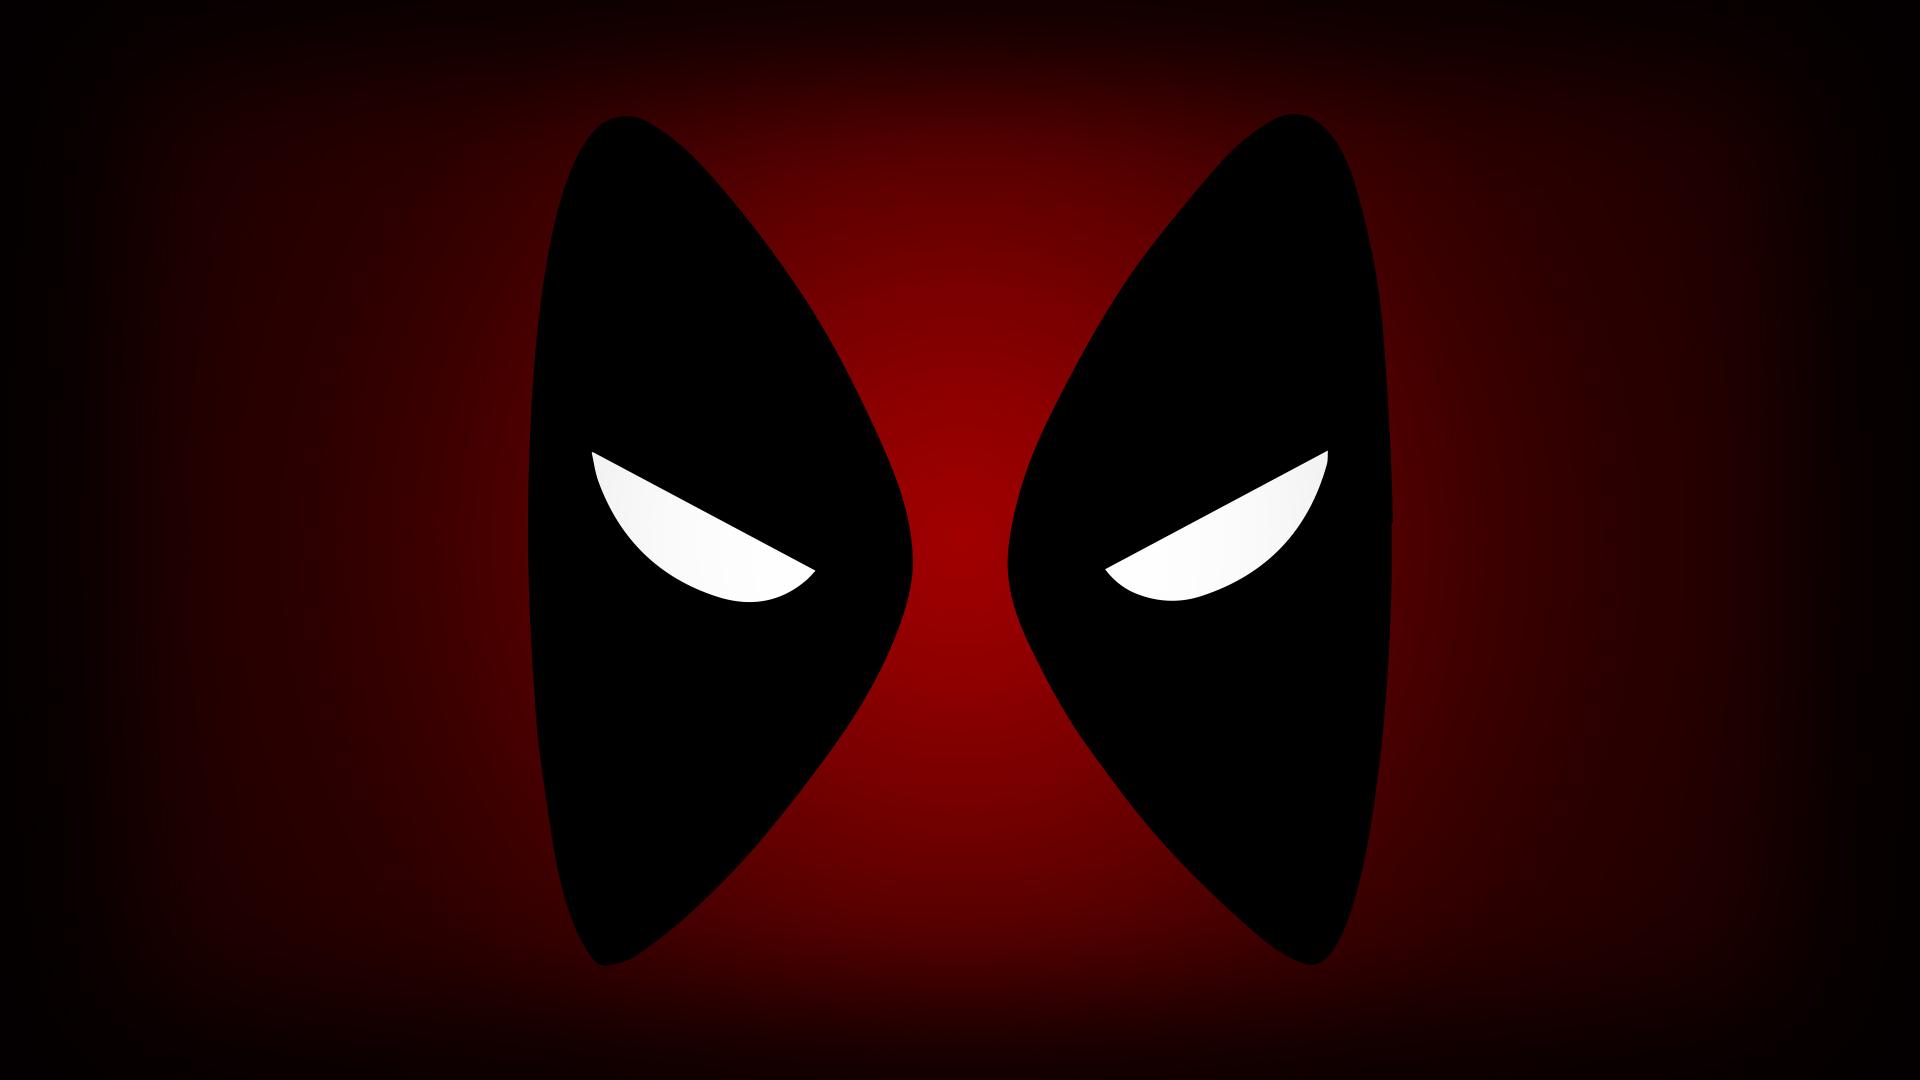 Deadpool Logo Hd Wallpaper